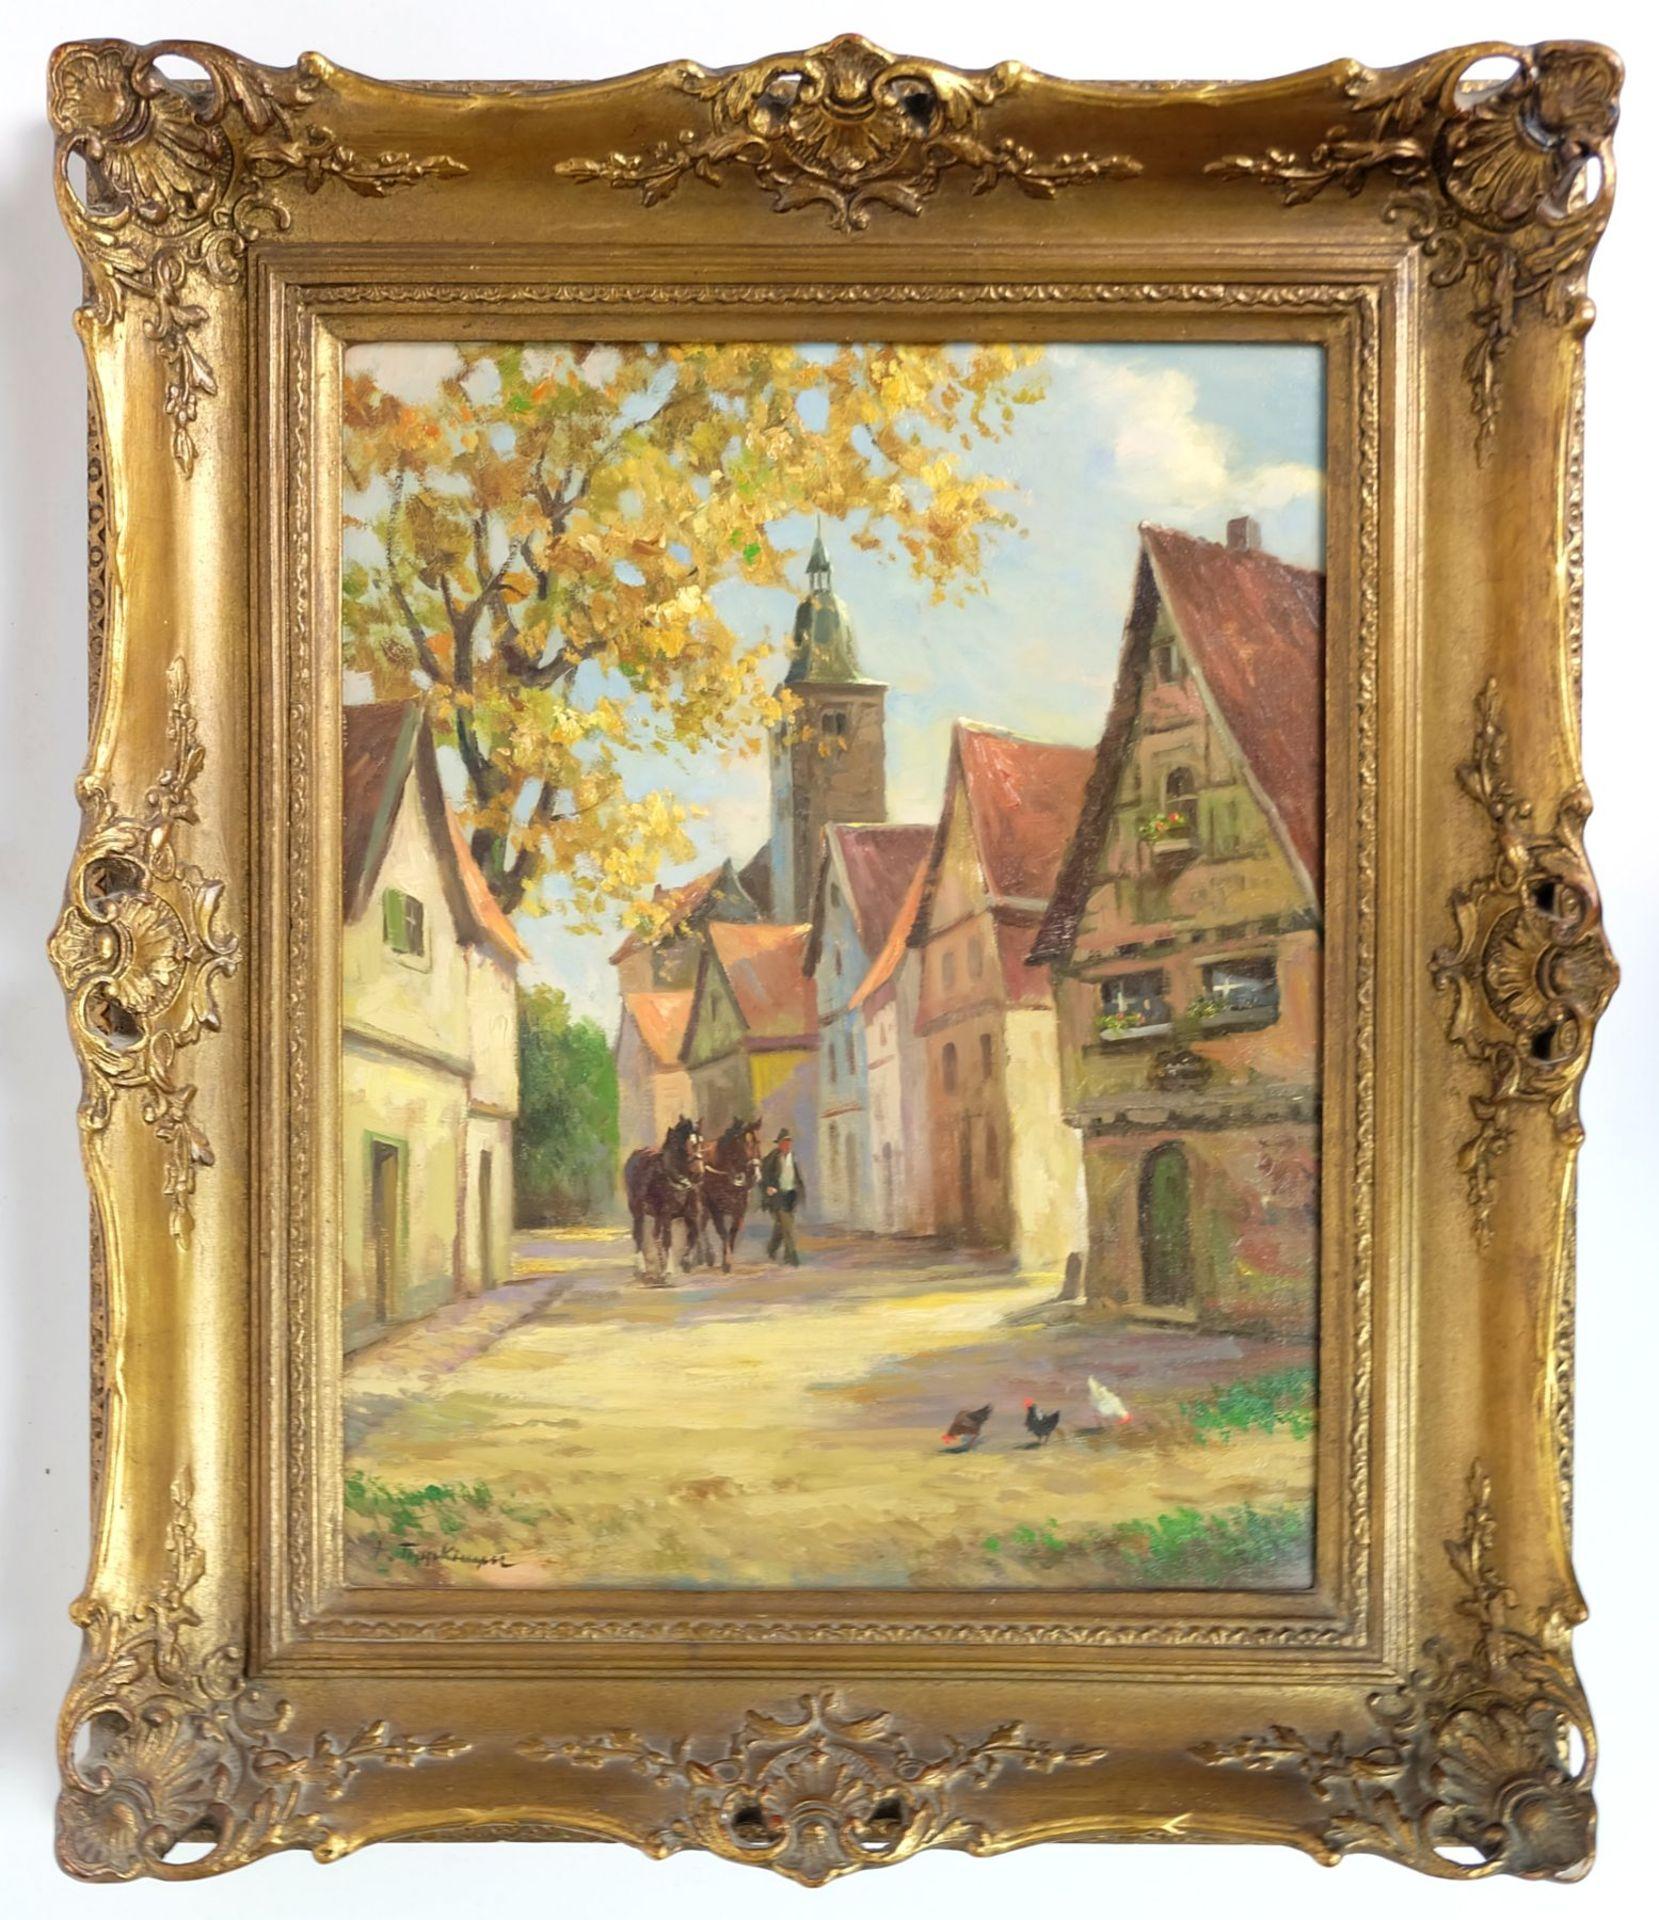 TIPPKEMPER, Josef (*1892 +?),